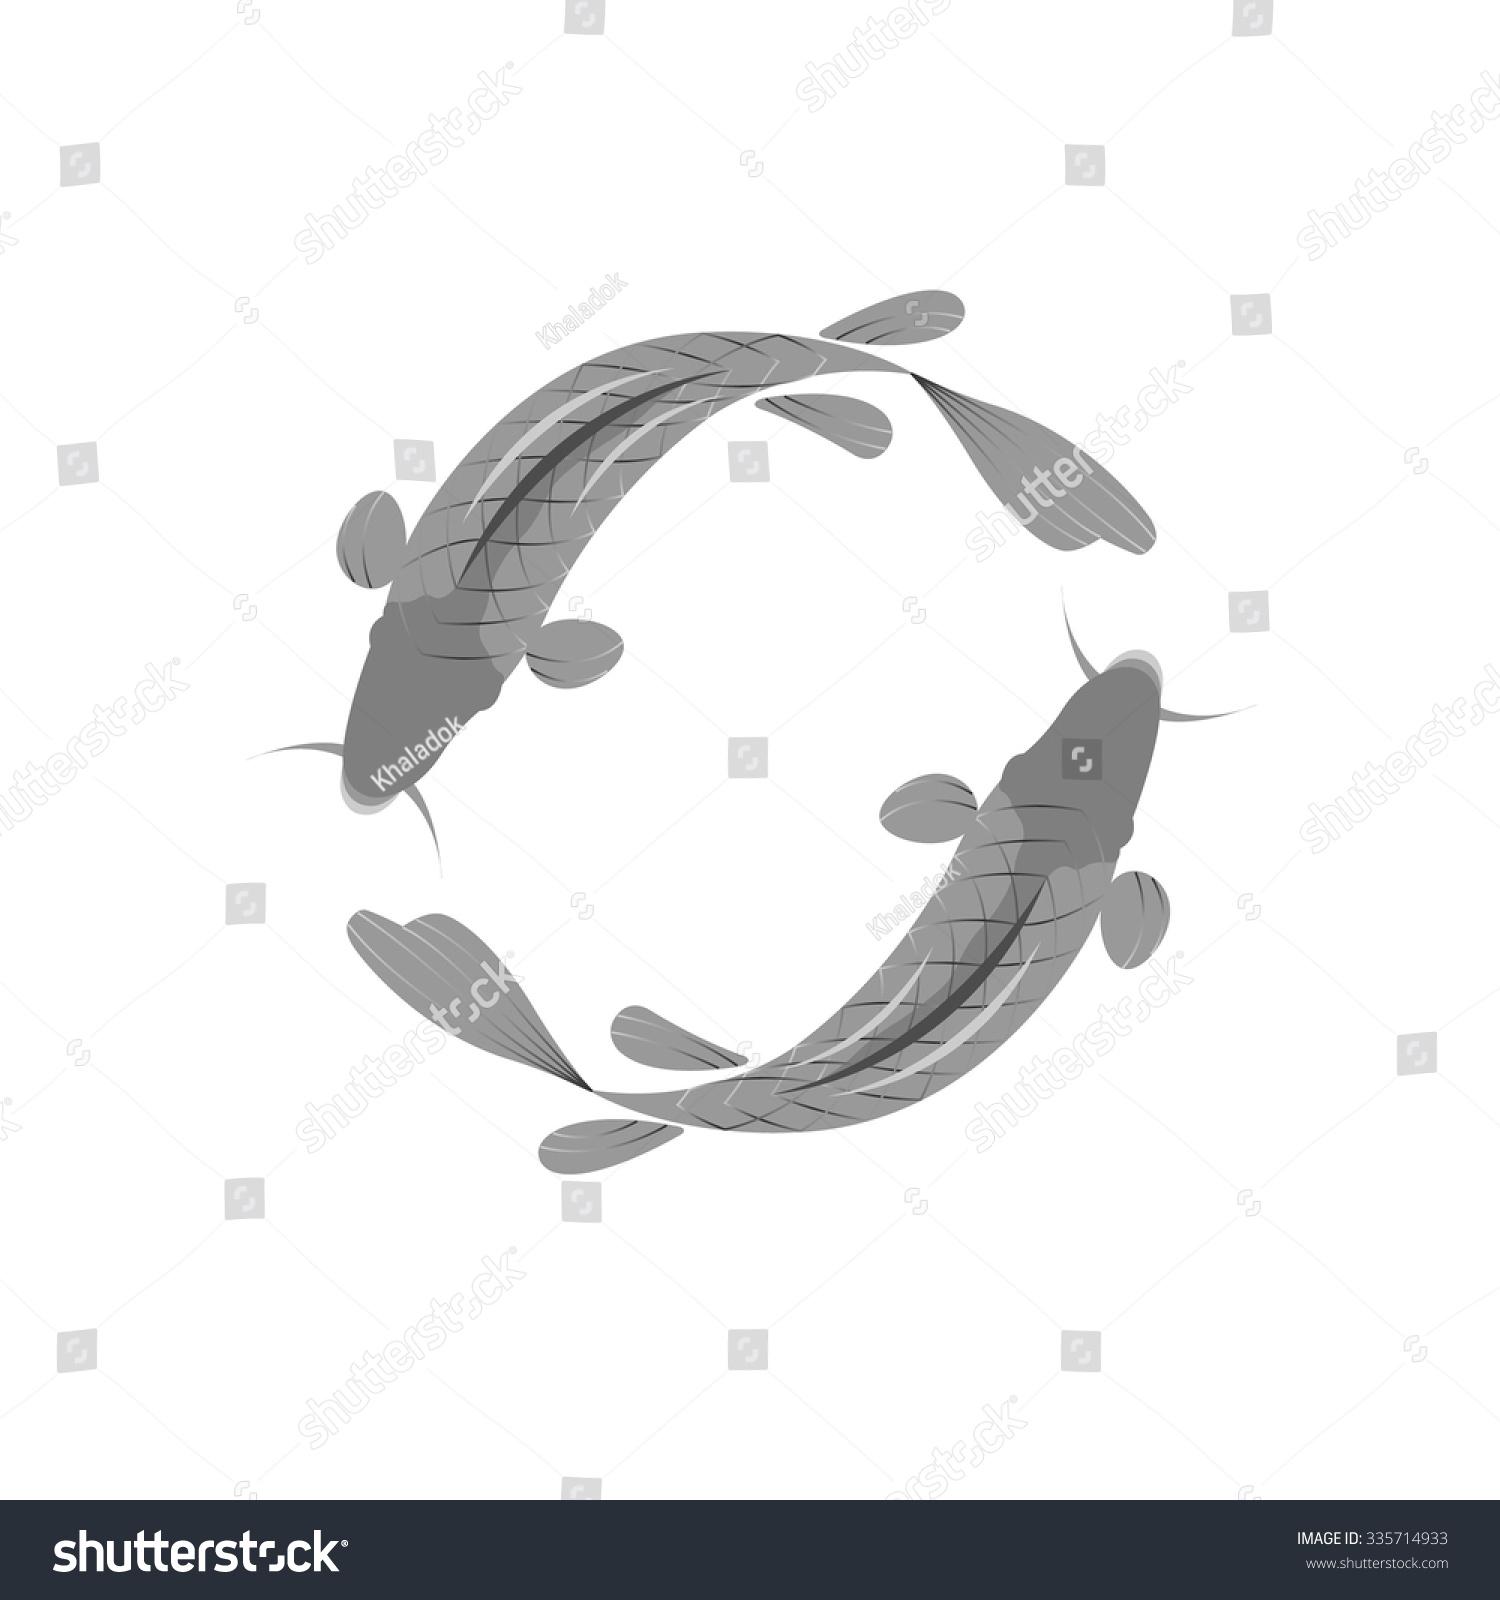 Two fish symbol for Dream interpretation fish